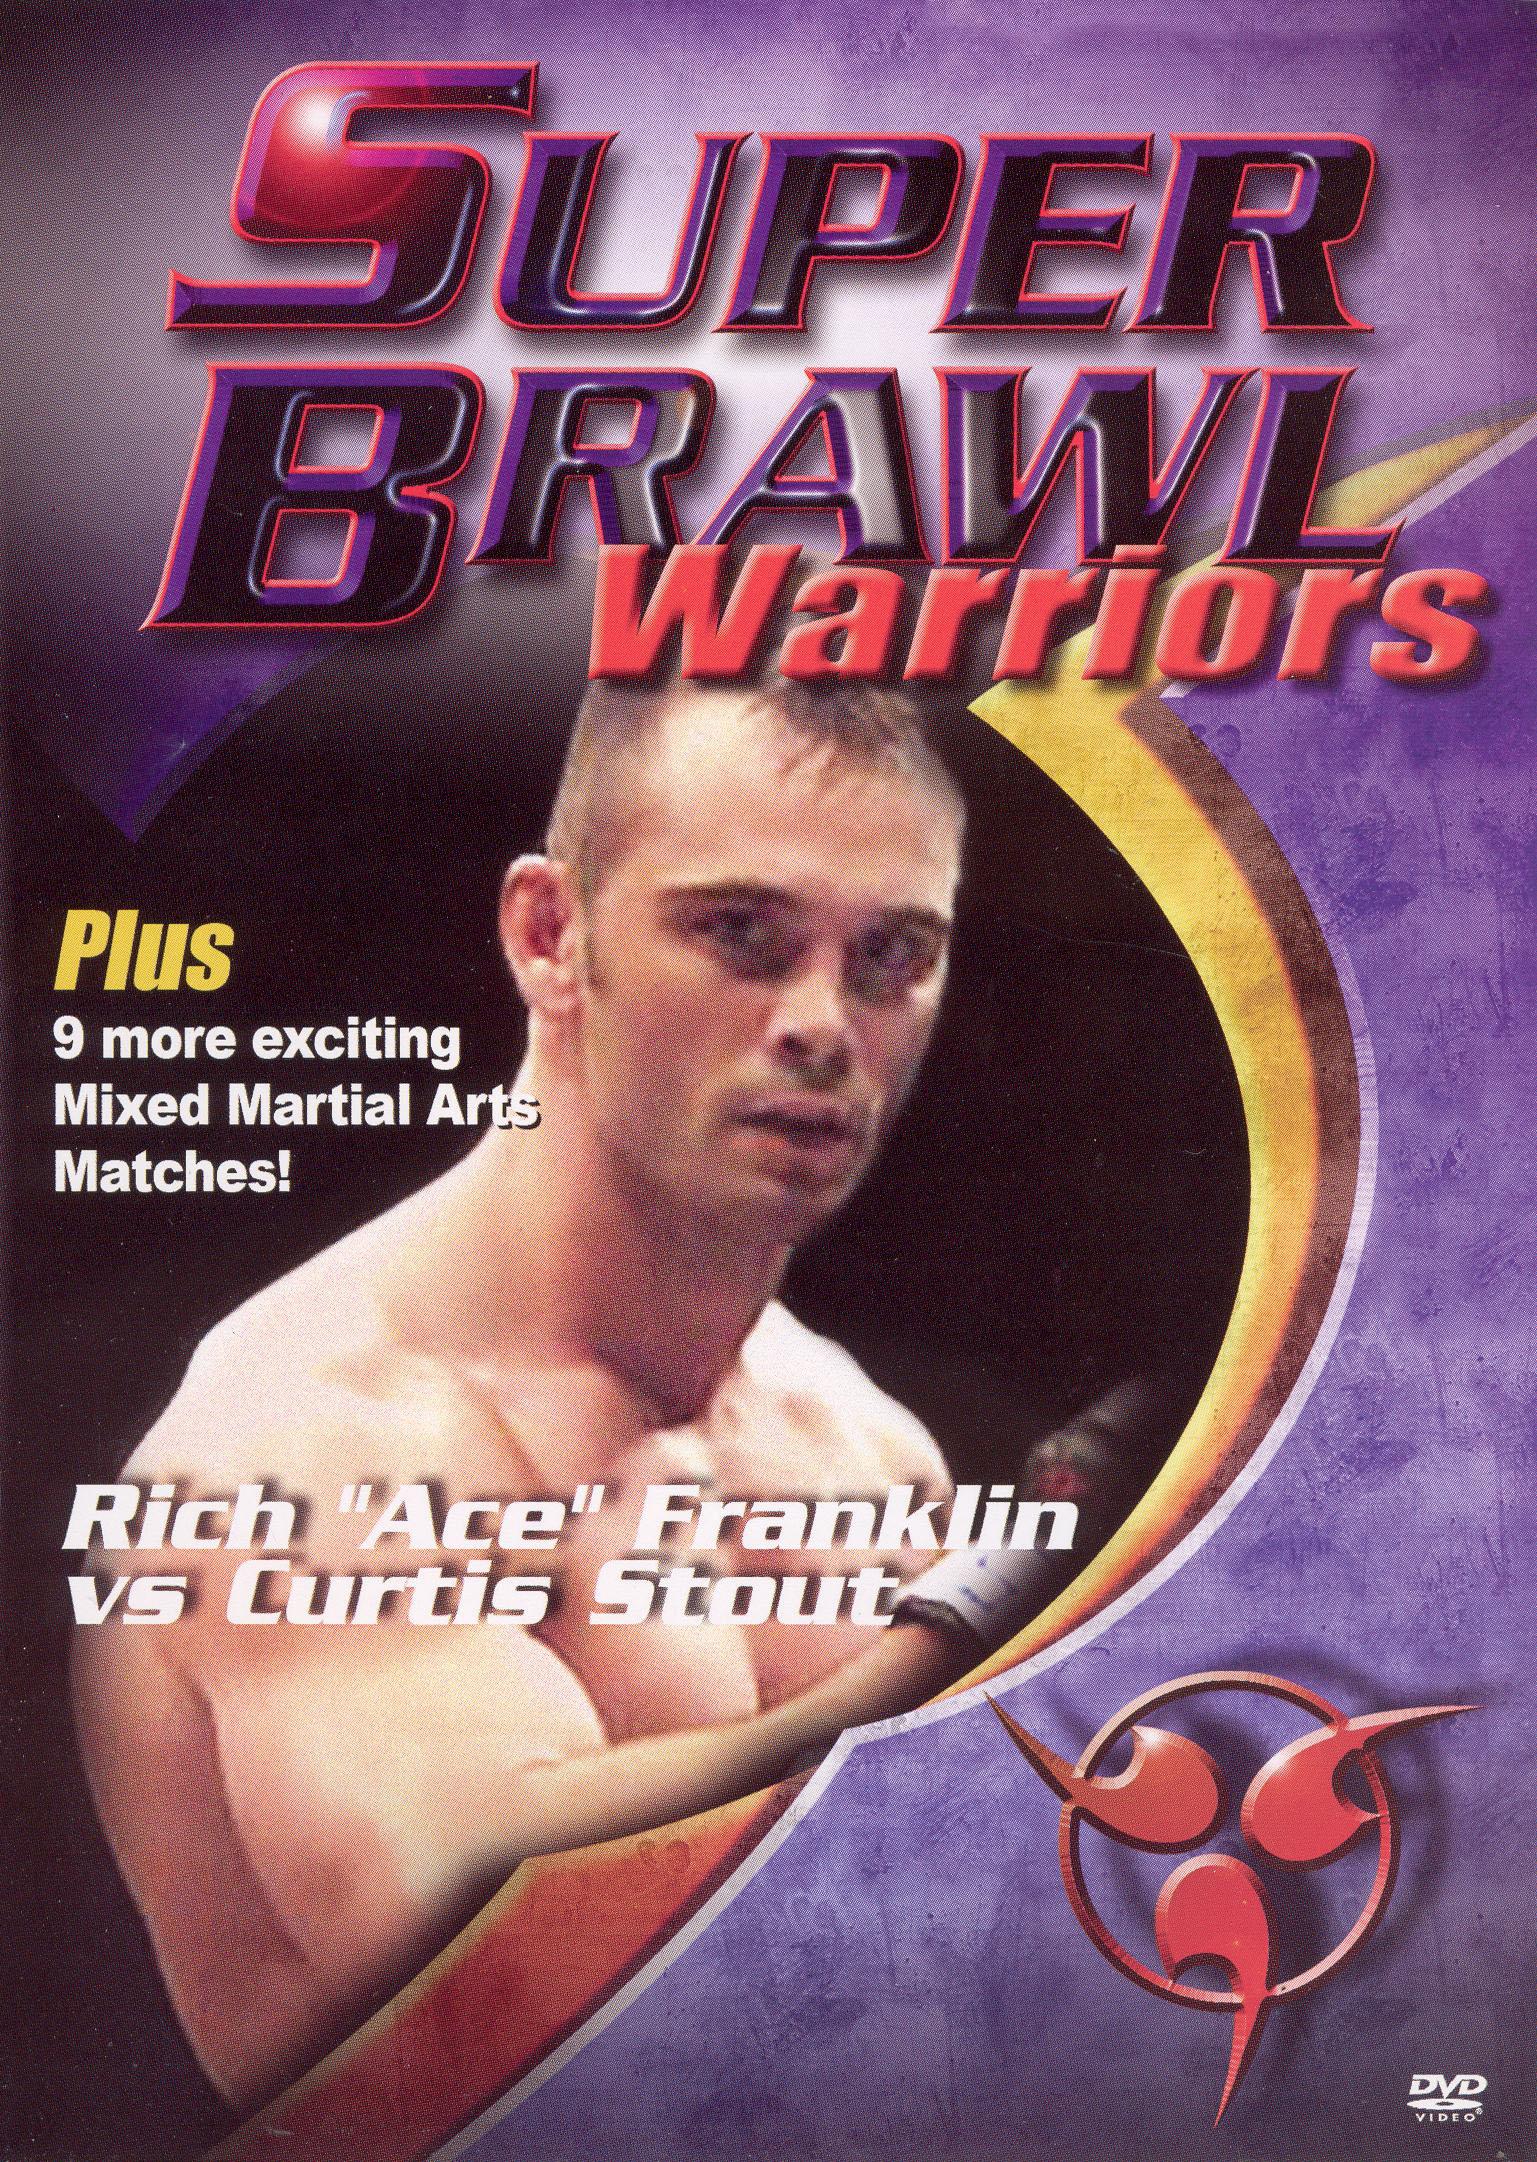 Super Brawl: Warriors